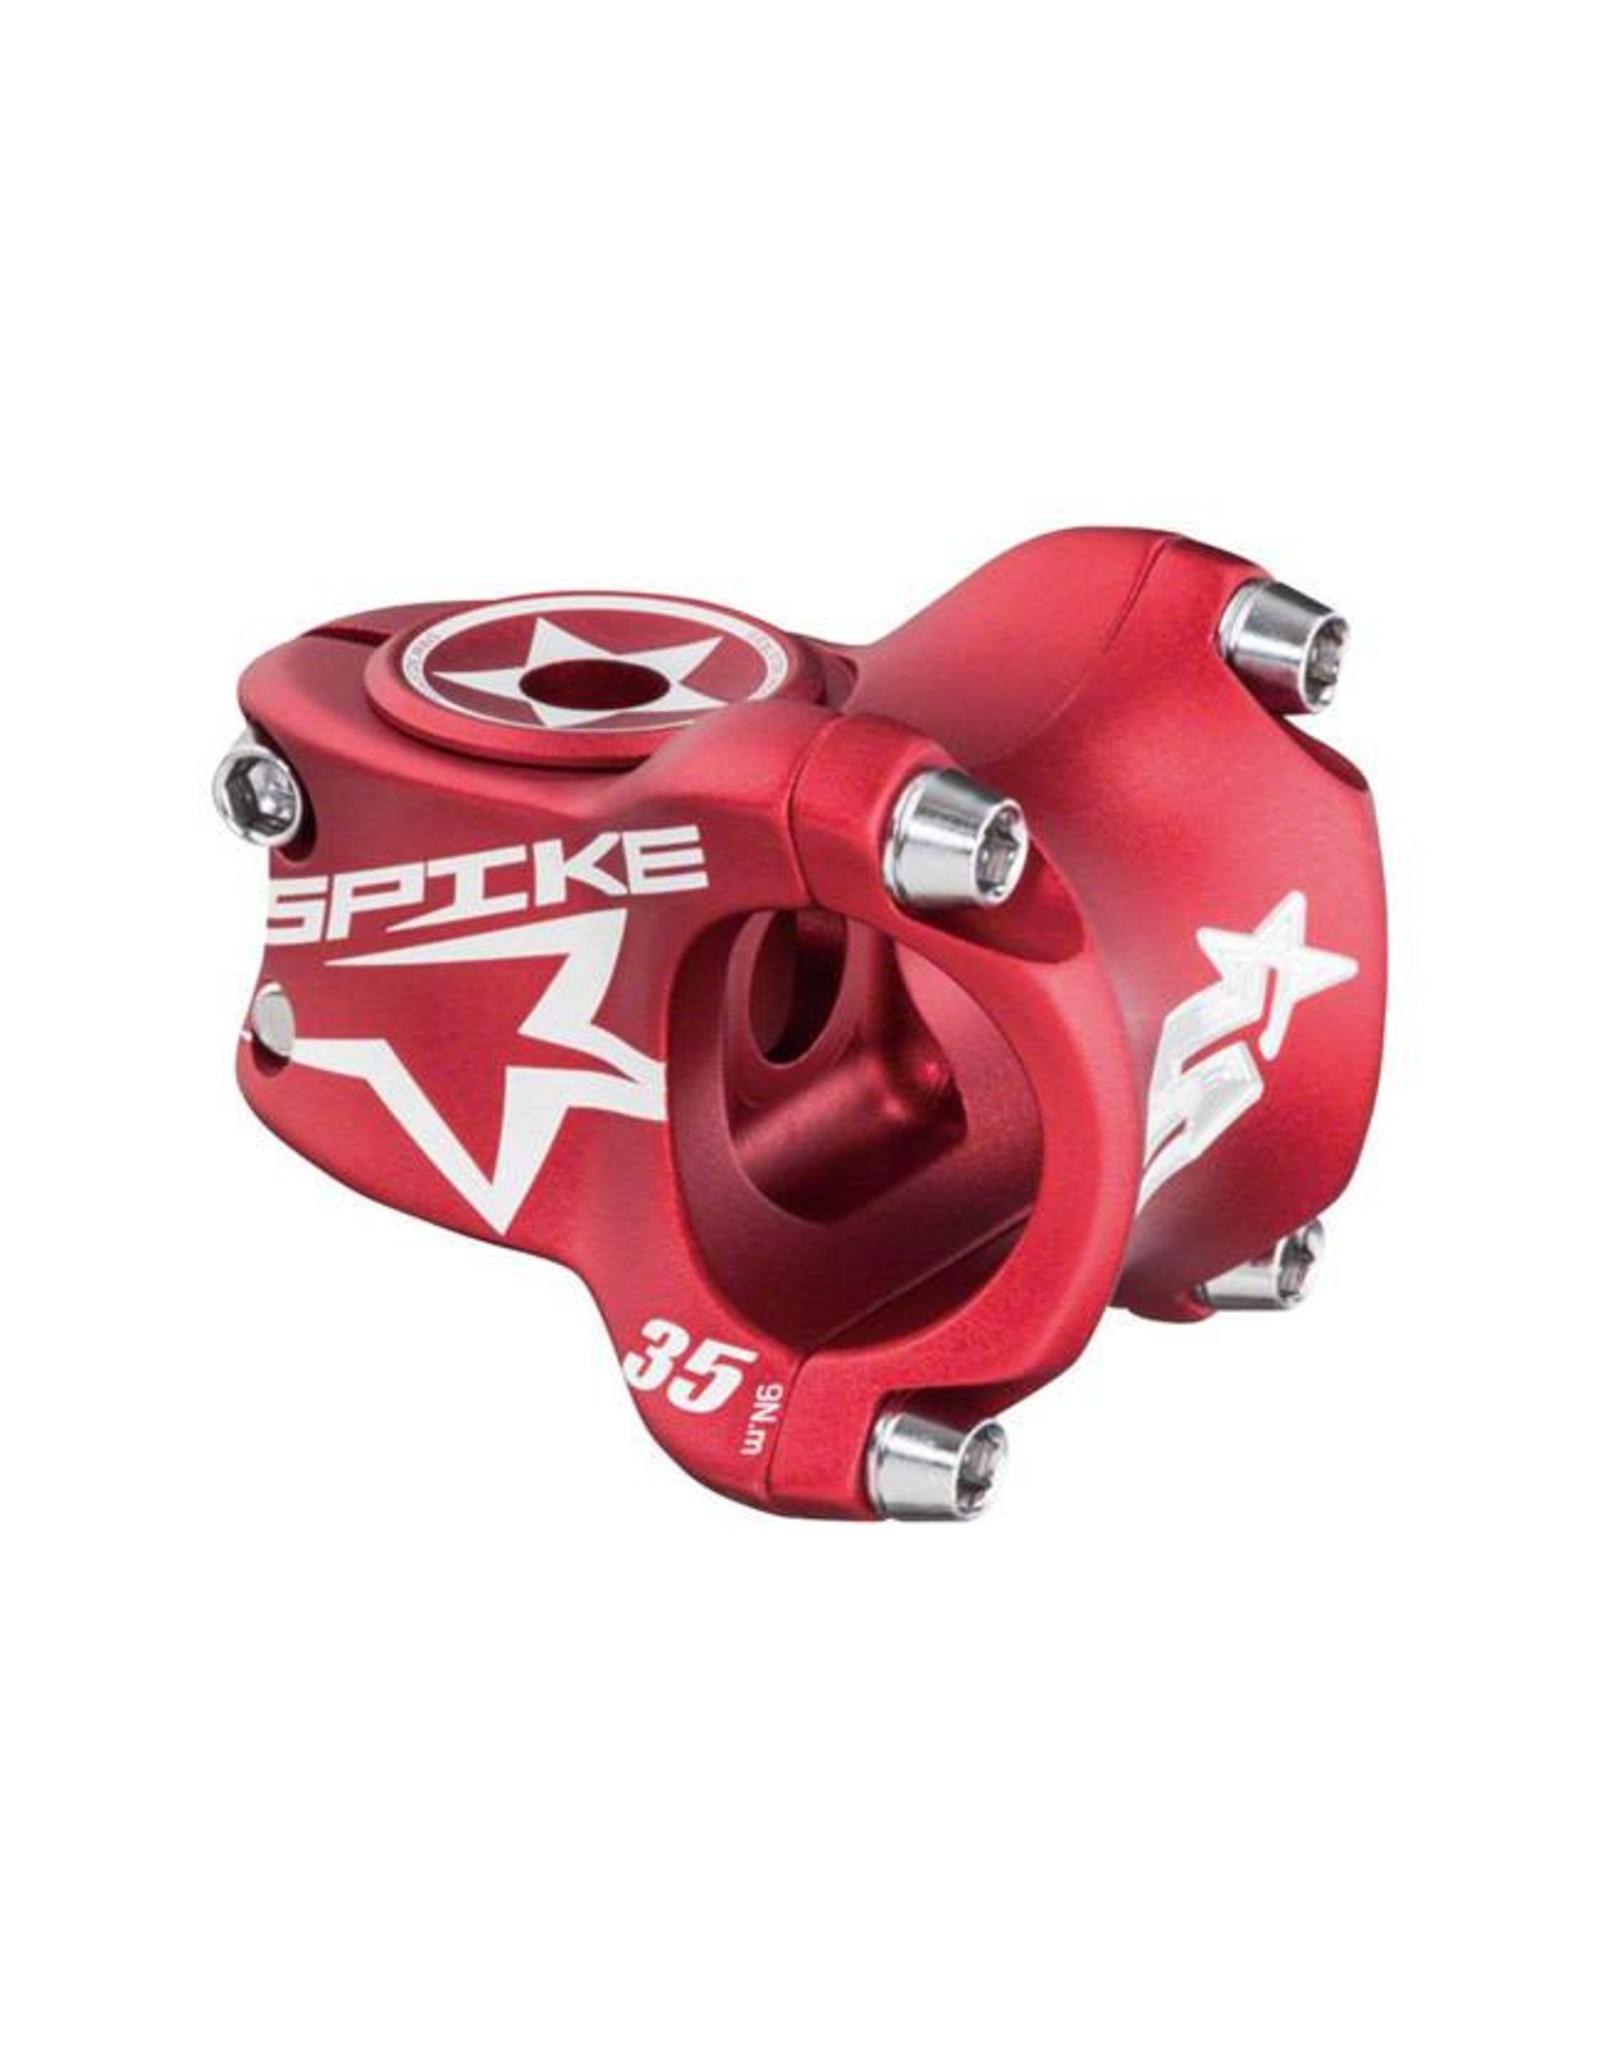 Spank Spank Spike Race Stem 35mm Length, 31.8 Bar Clamp, Matte Red